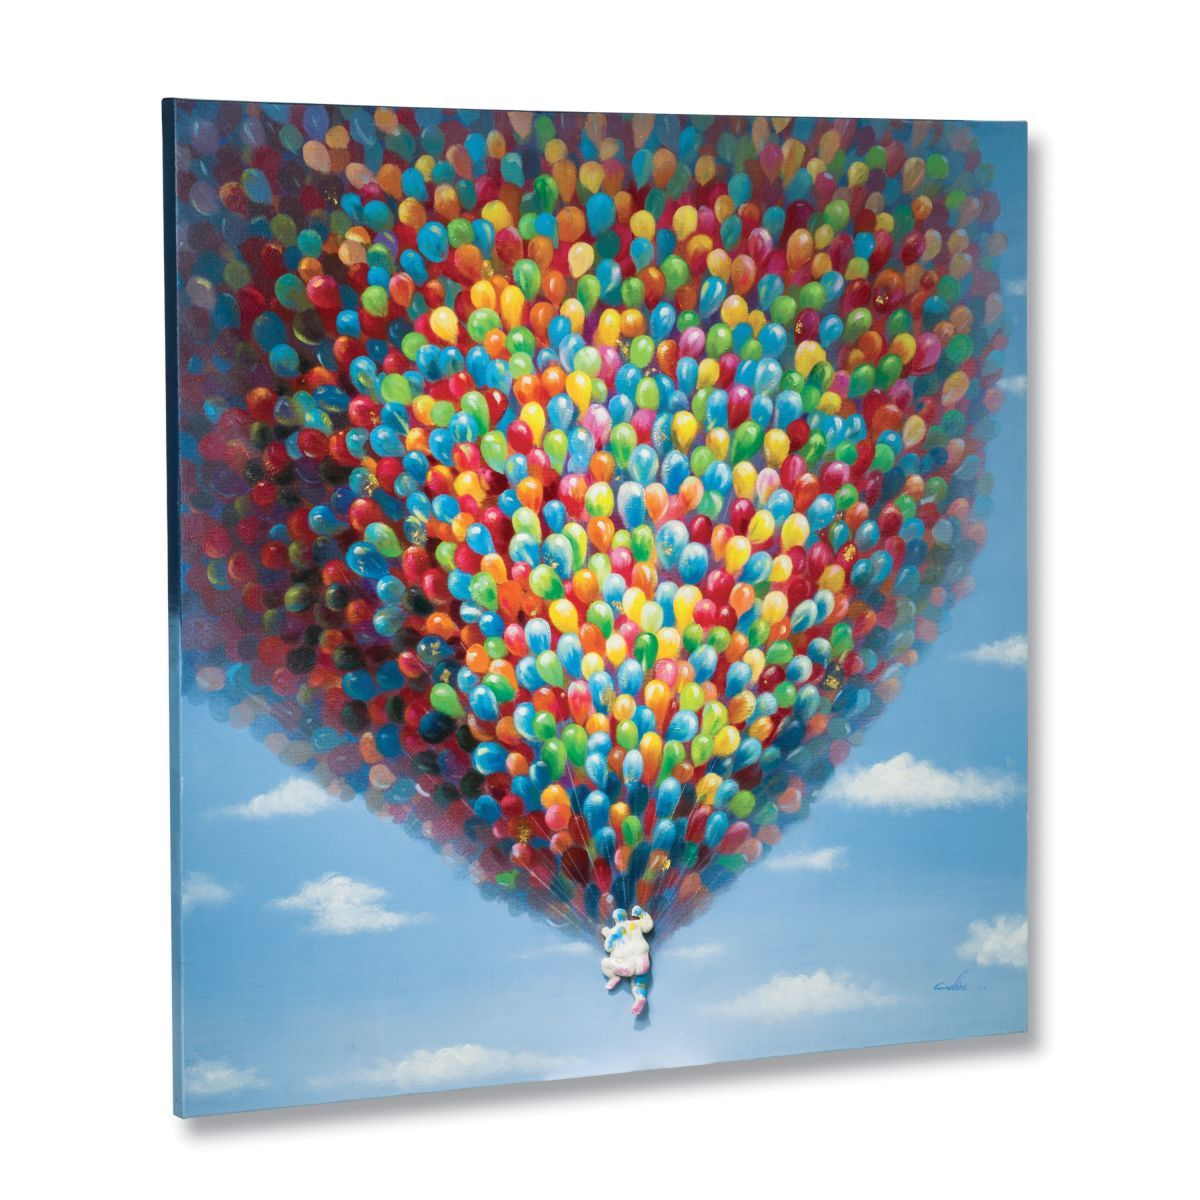 Bild Balloons, Leinwand, Acryl Jetzt bestellen unter: https://moebel ...